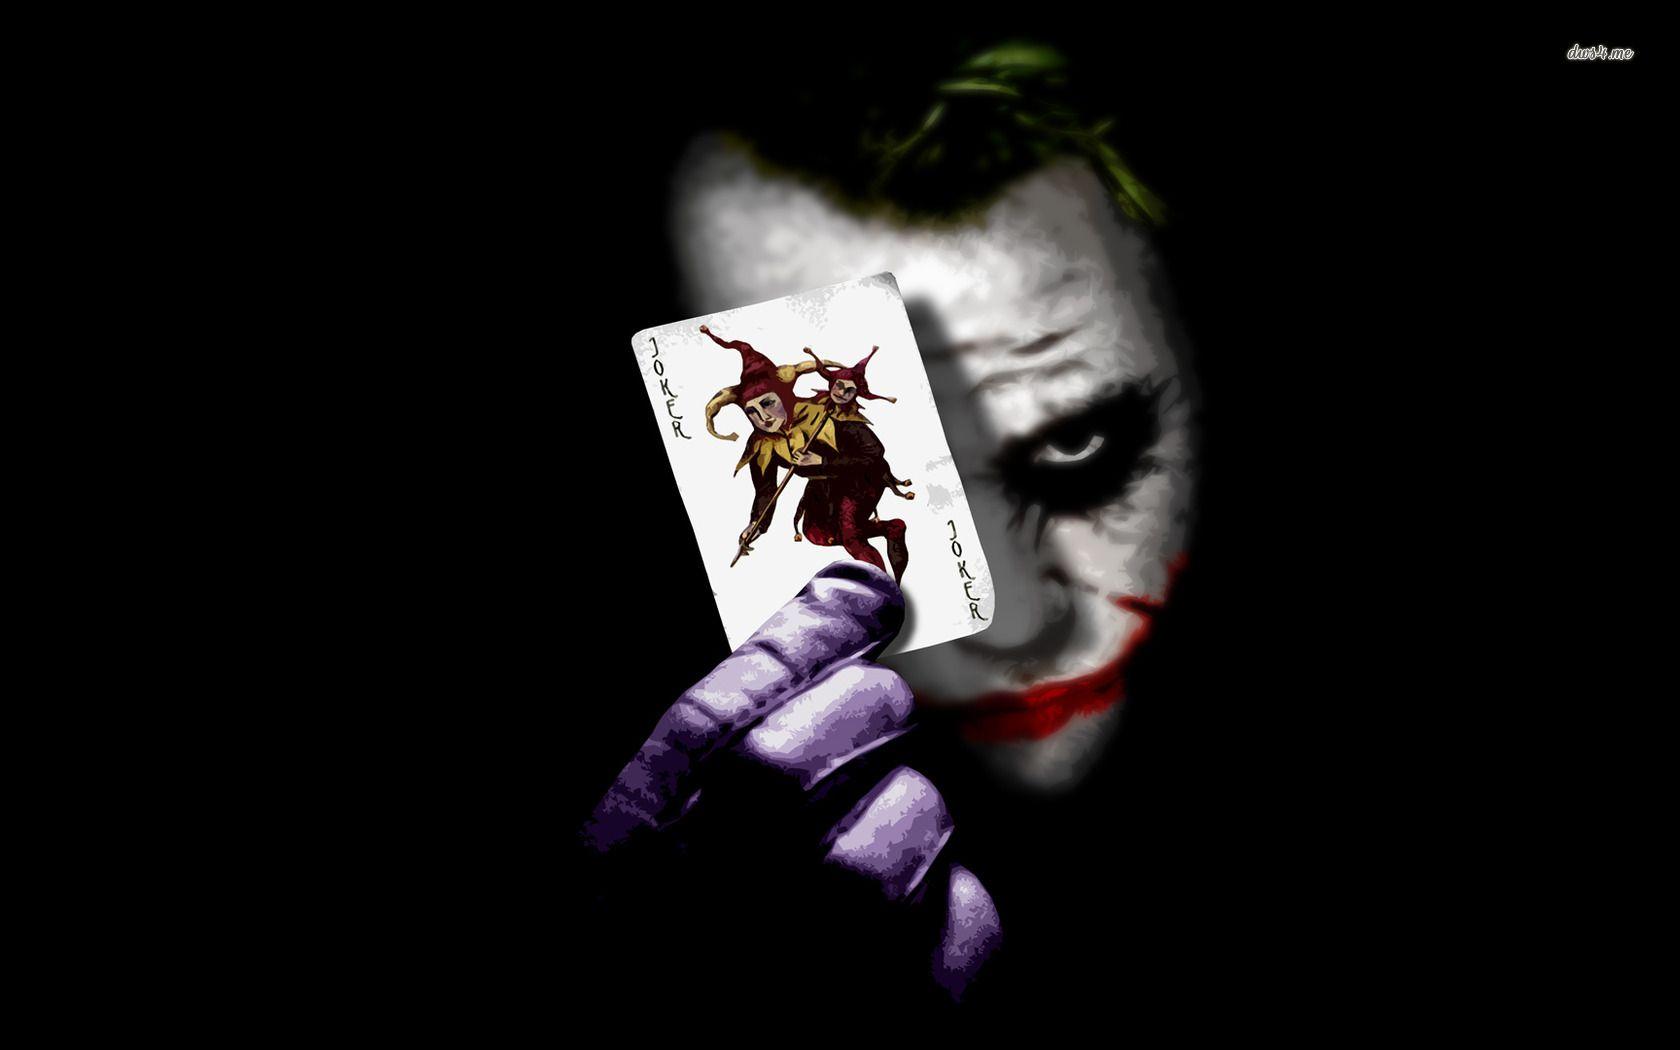 batman: the dark knight hd wallpapers backgrounds wallpaper 1280×960